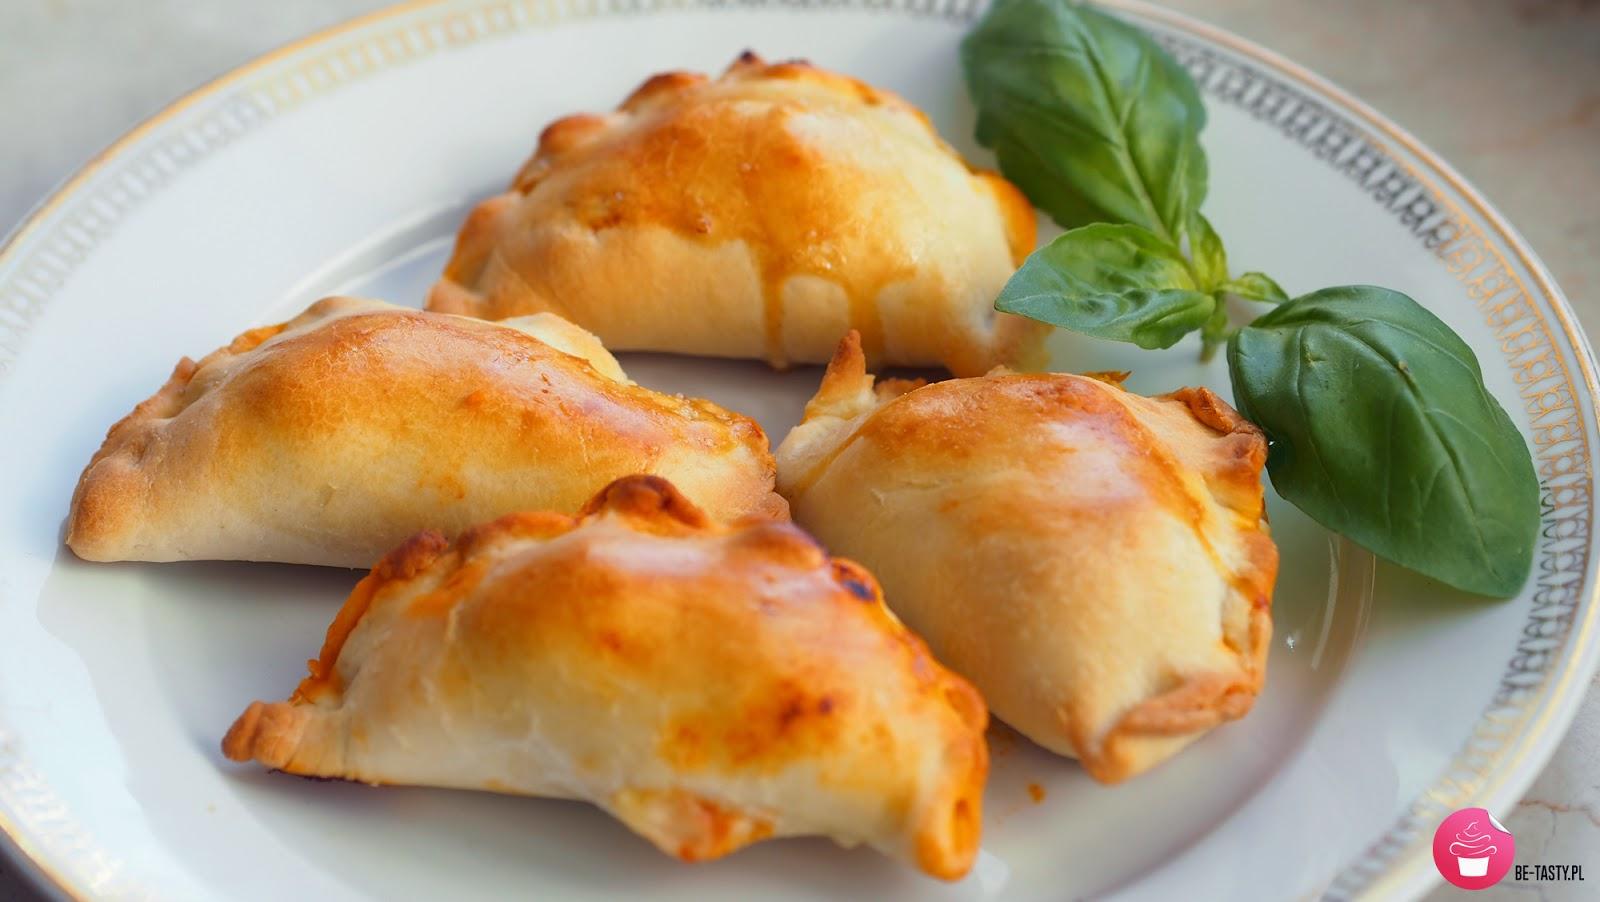 http://be-tastyblog.blogspot.com/2015/04/zapiekane-pierogi-bolognese.html